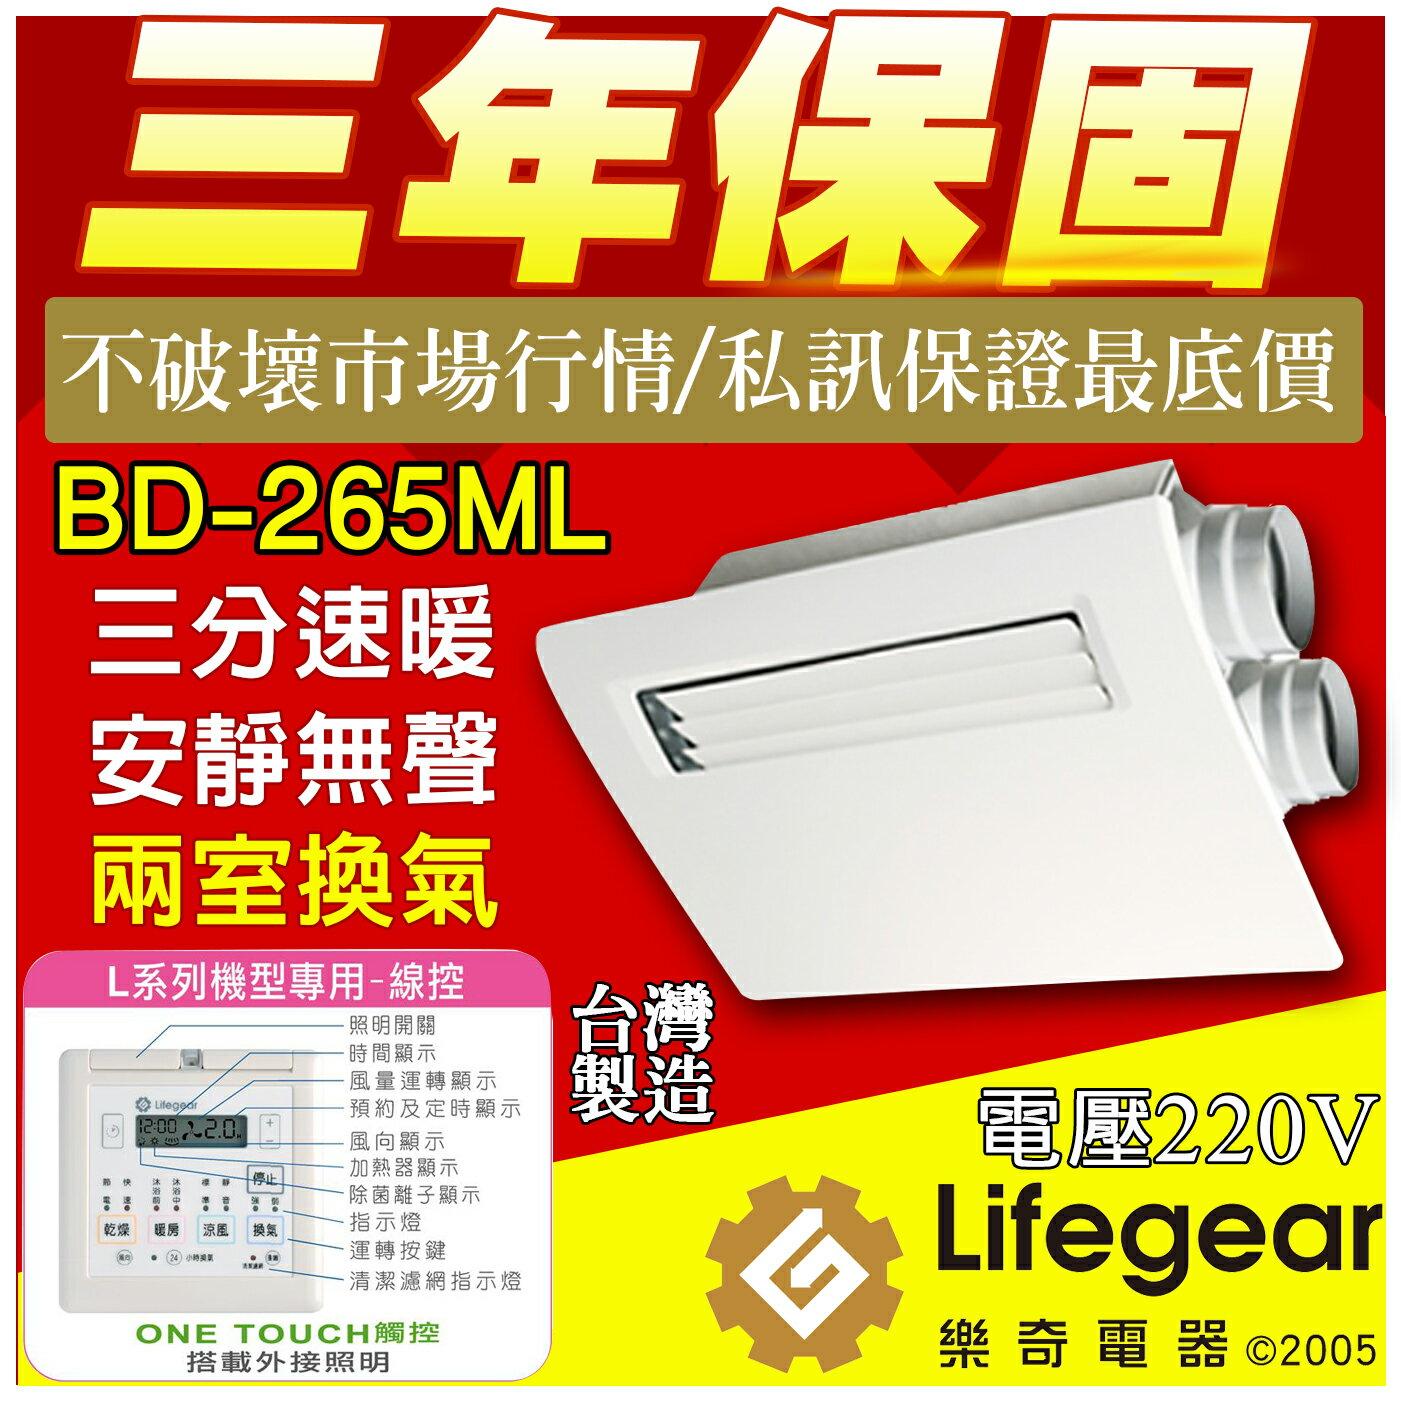 <br/><br/>  【東益氏】中日技術Lifegear 樂奇 BD-265ML浴室暖風機 乾燥機  三年保固(220V)~二室換氣廣域送風 售阿拉斯加 國際牌 康乃馨<br/><br/>